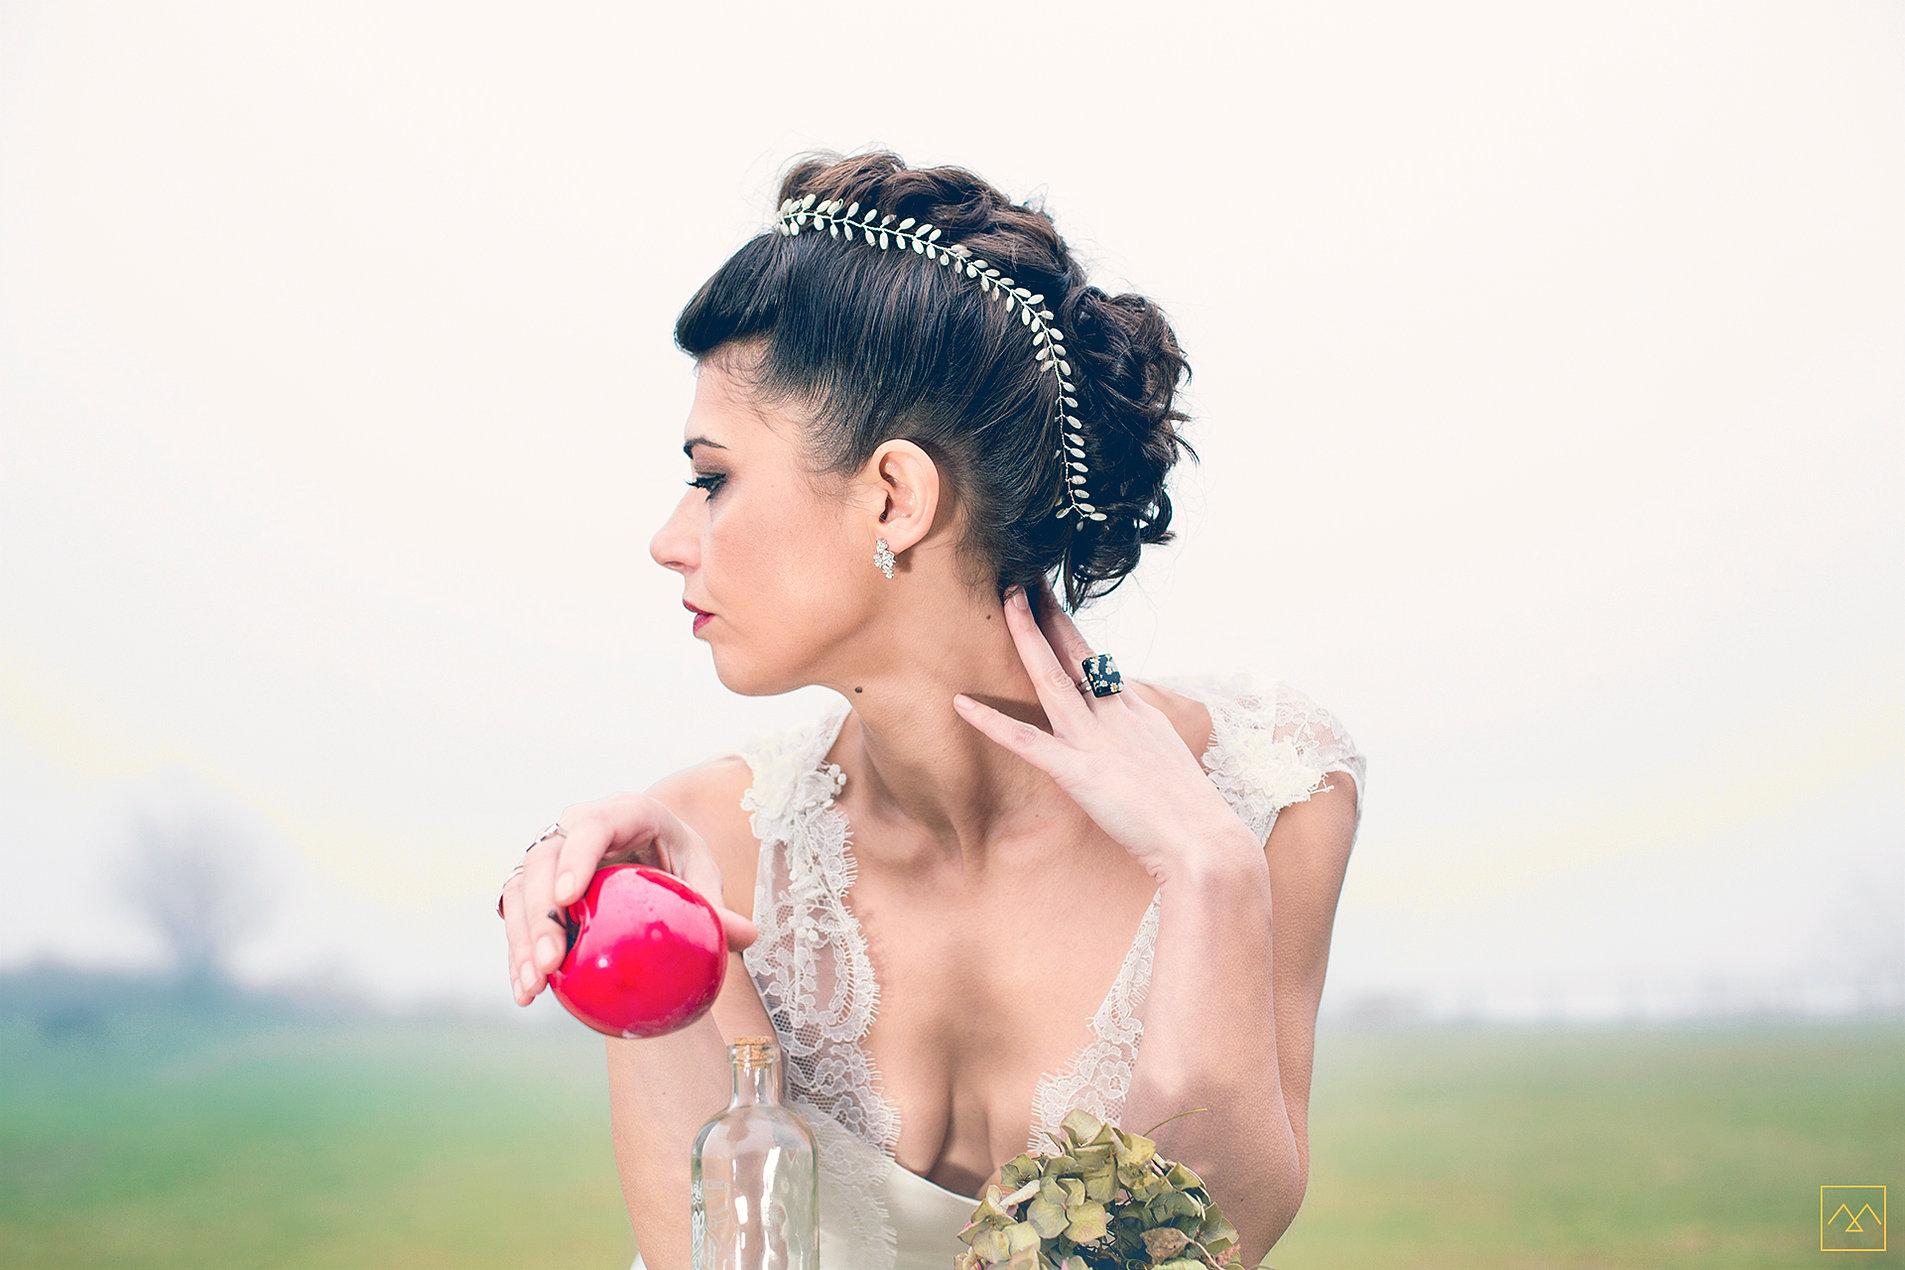 6 anna cruz maquillage et coiffure mariage lyon shooting inspiration collection 2017 - Coiffeuse Maquilleuse Mariage Lyon